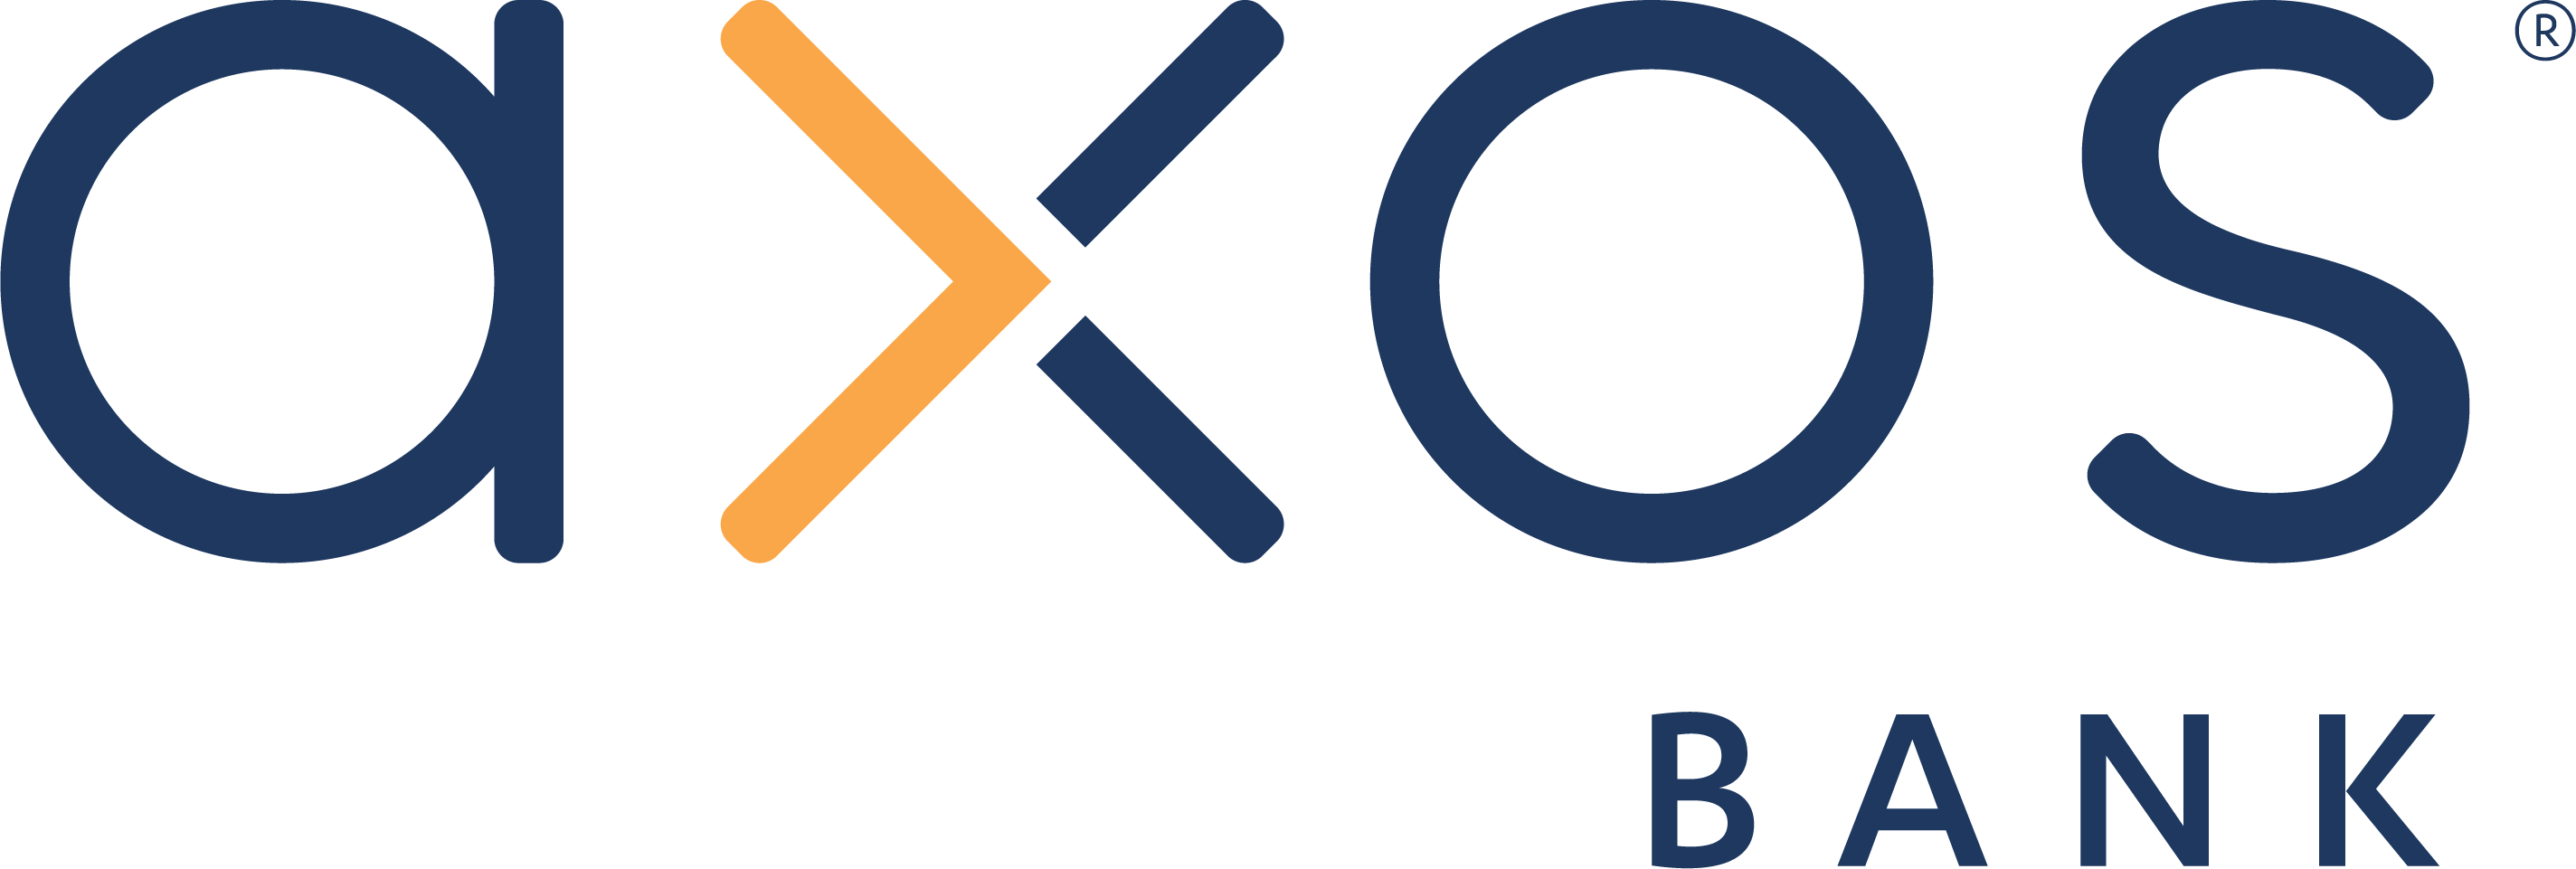 Axos Bank Personal Loan